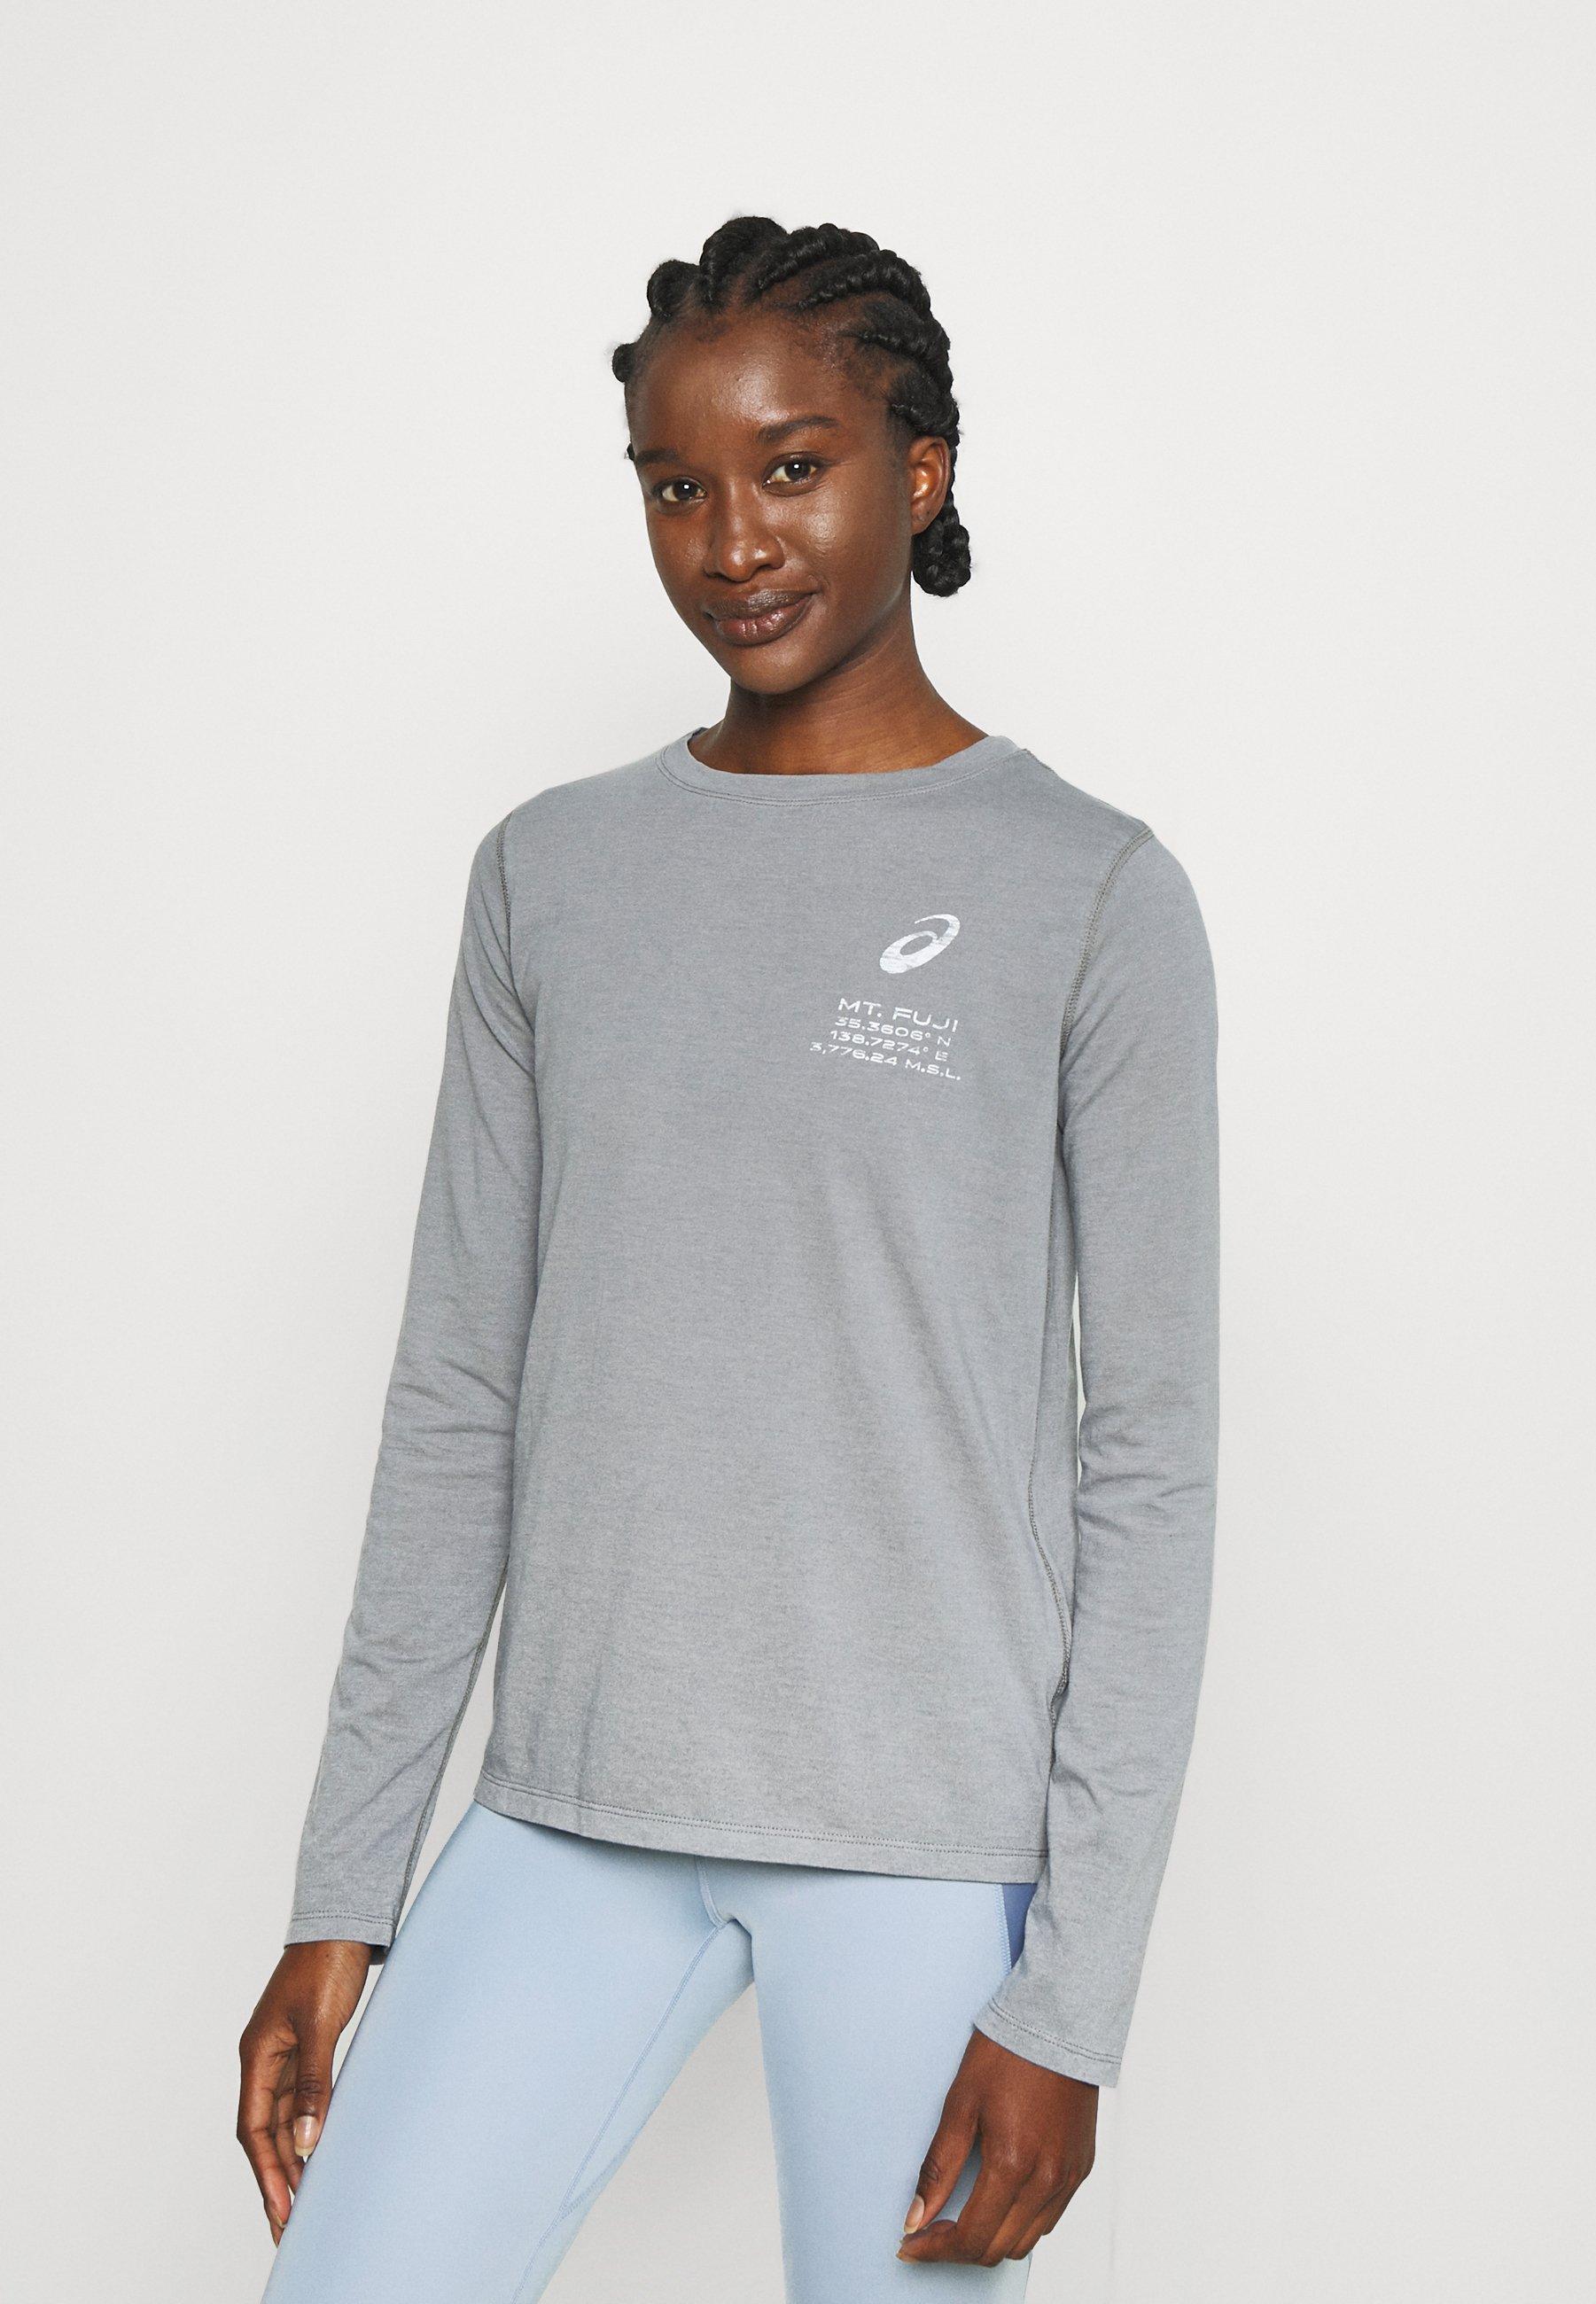 Femme FUJI TRAIL TEA - T-shirt à manches longues